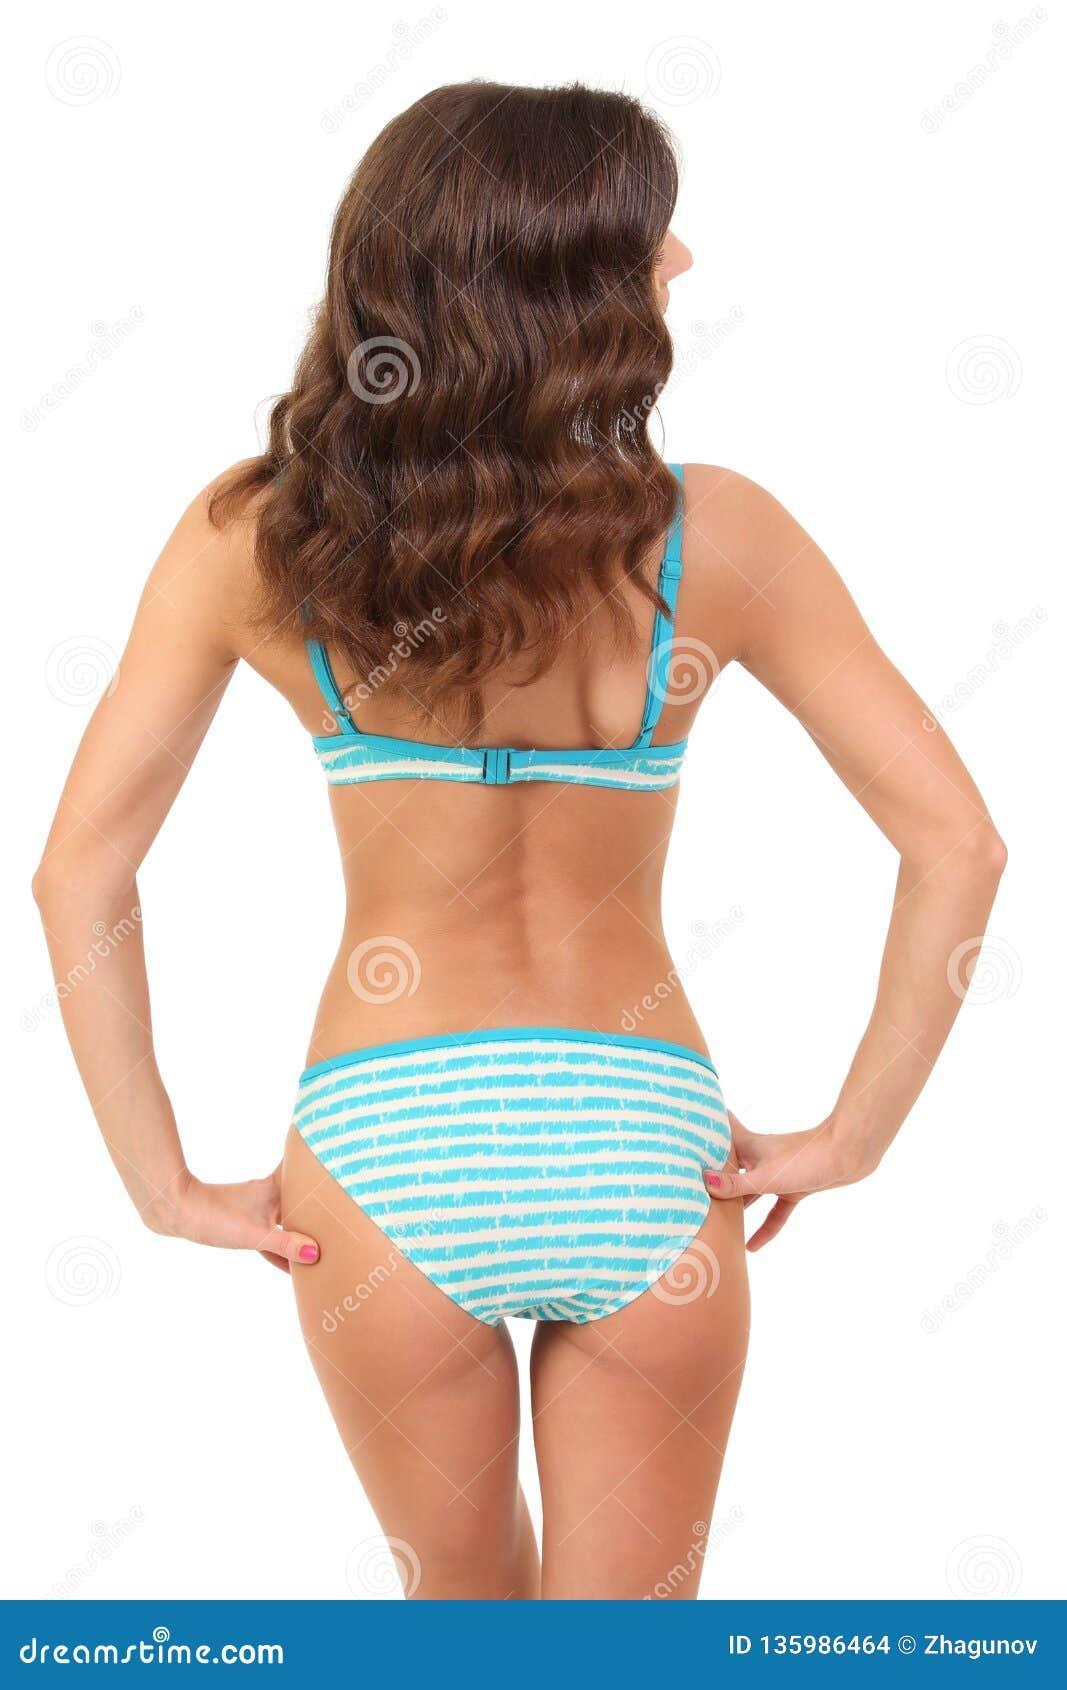 Backview do biquini vestindo fêmea